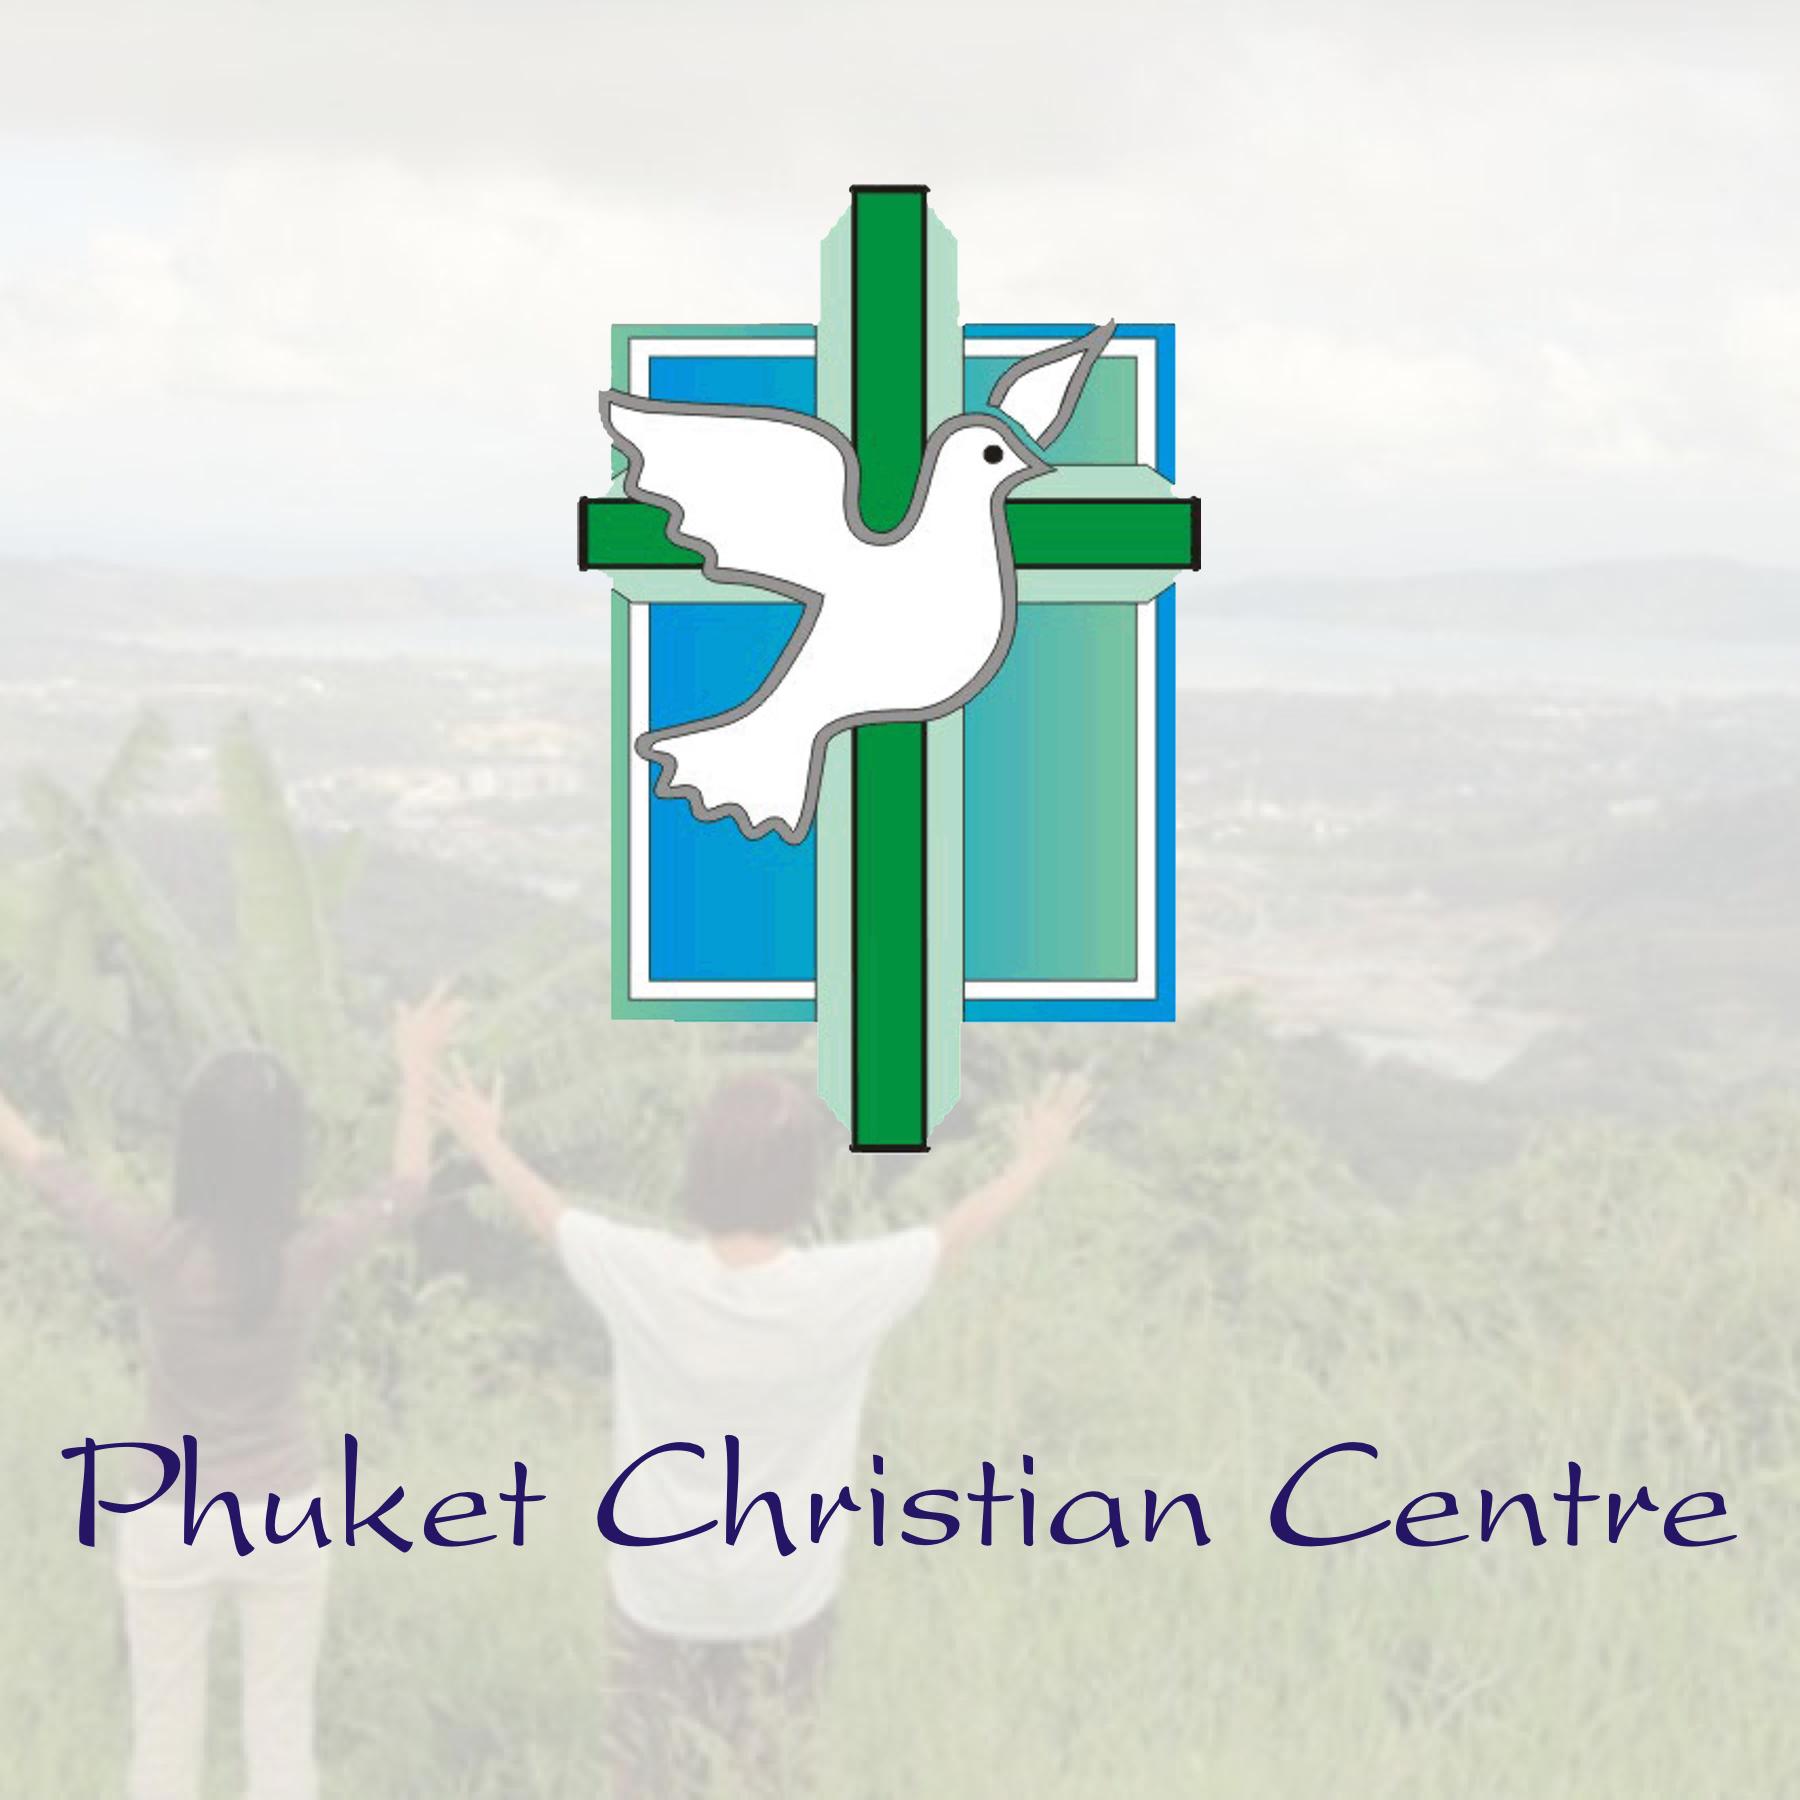 Phuket Christian Centre คริสเตียนสัมพันธ์ภูเก็ต - Podcasts